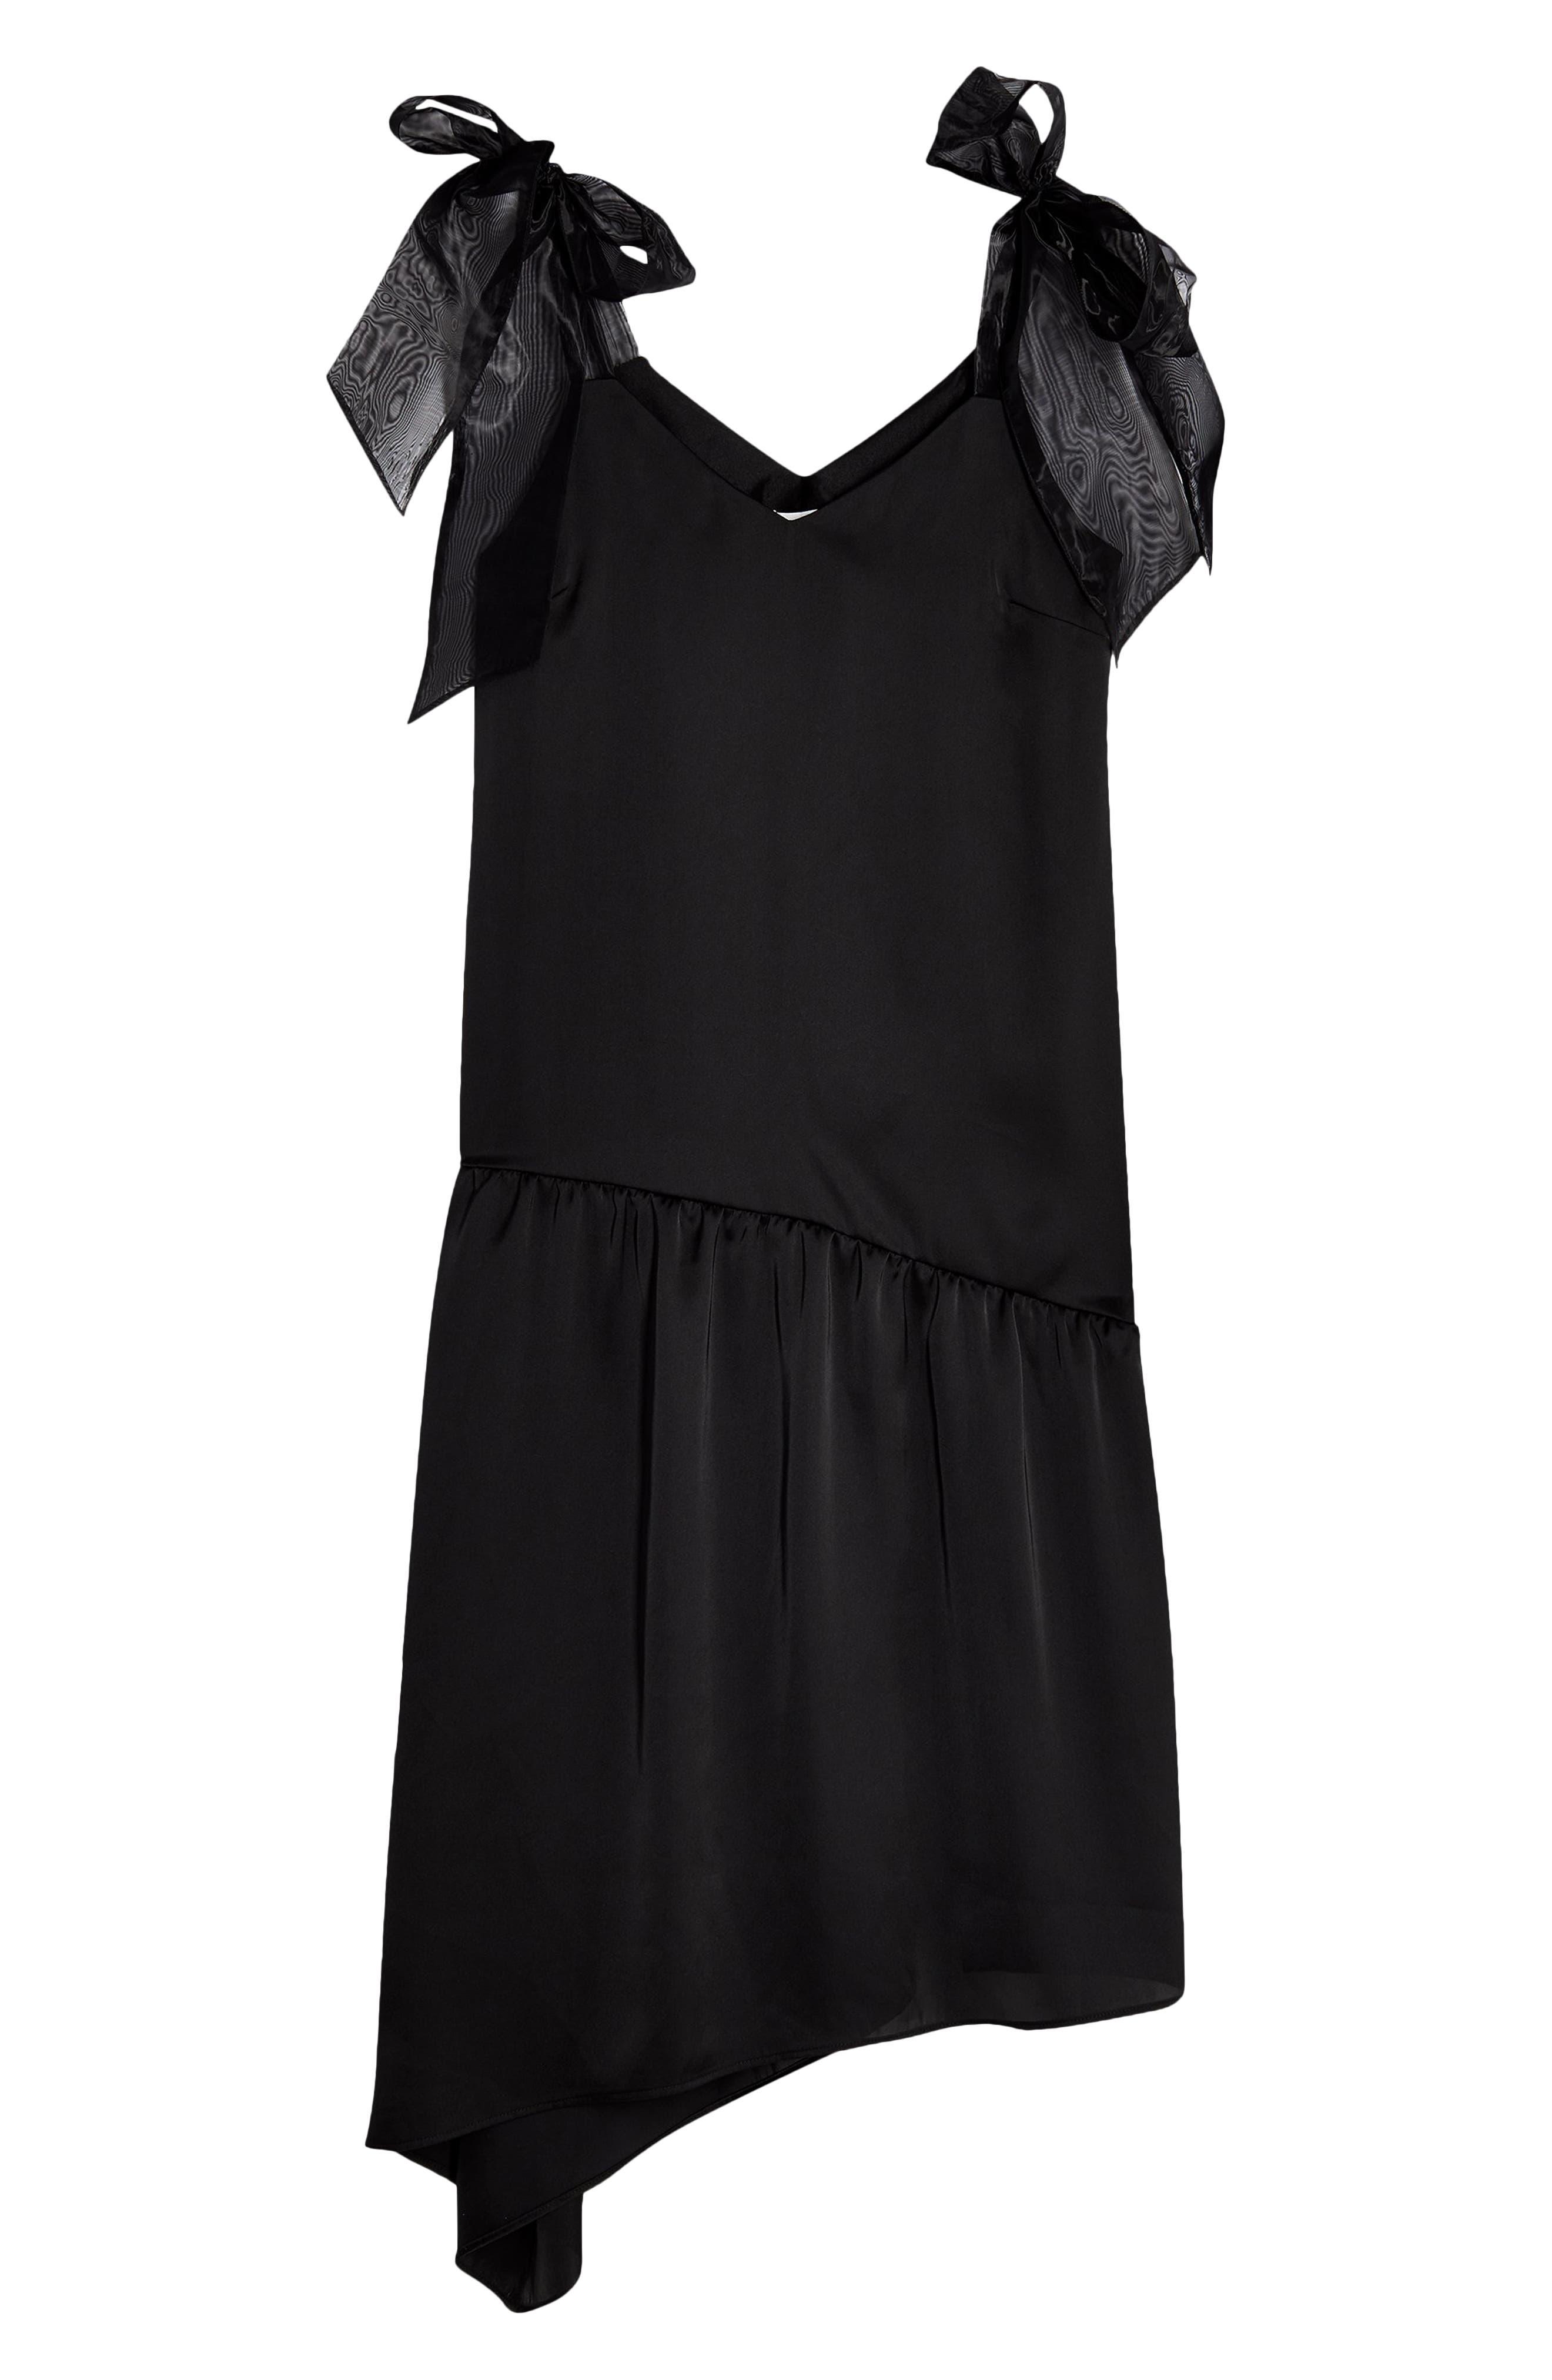 Flapper Dresses, Quality 1920s Flapper Dress Womens Topshop Organza Bow Slipdress Size 4 US - Black $49.99 AT vintagedancer.com